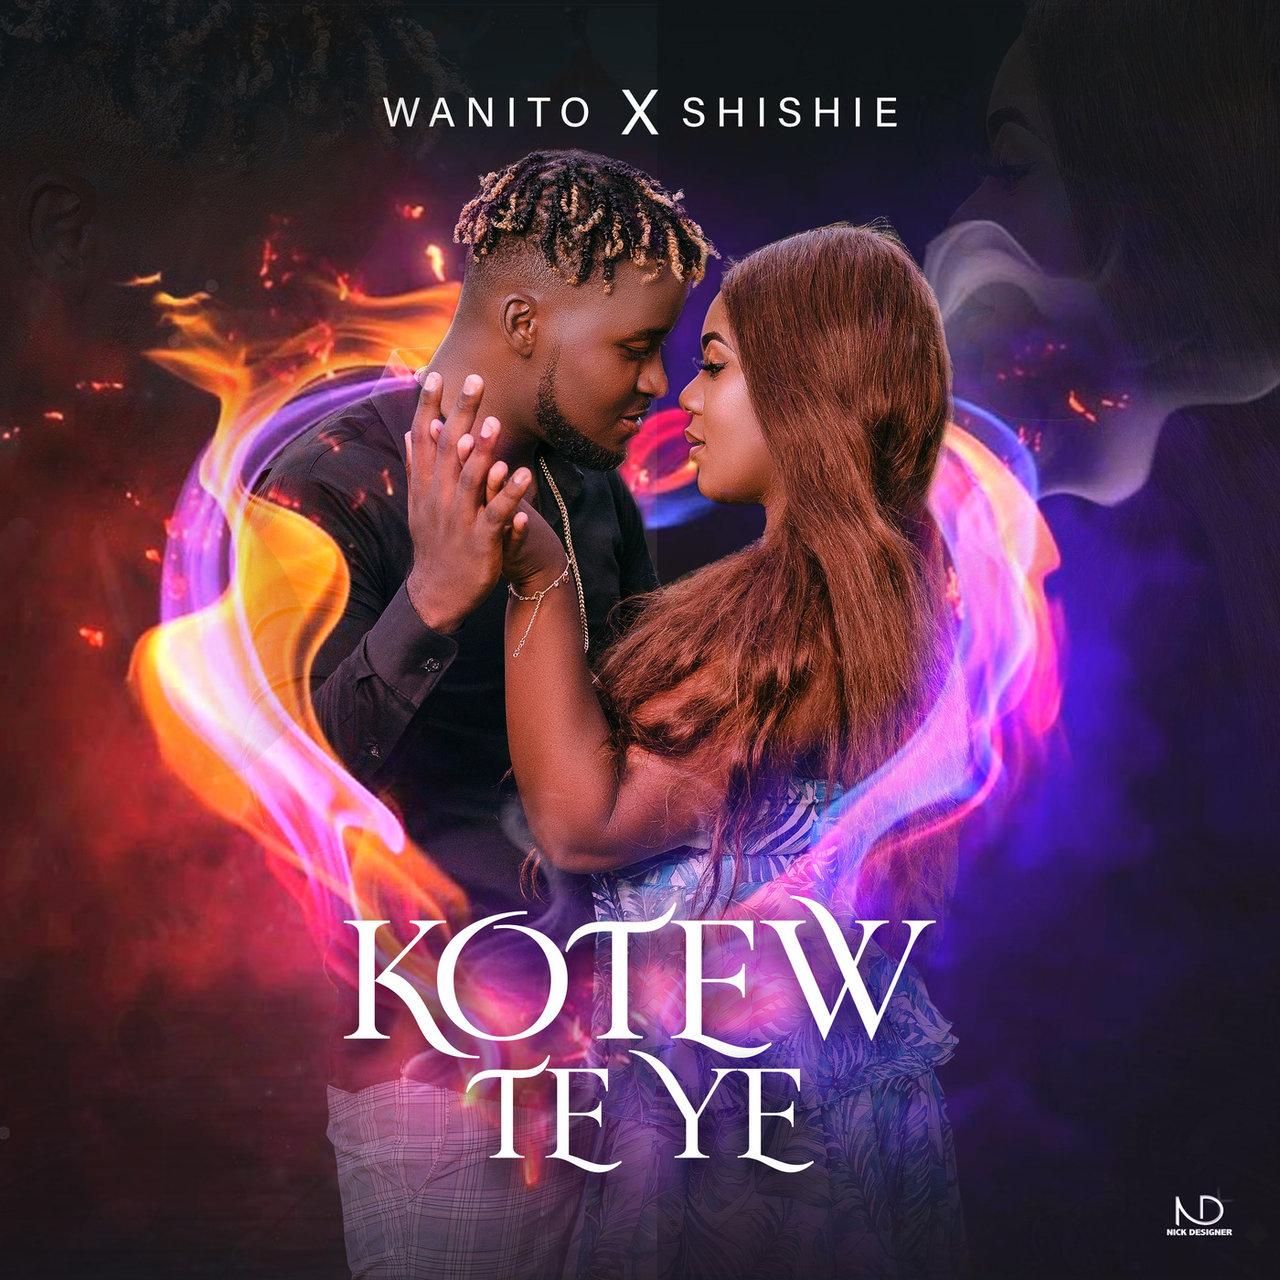 Wanito - Kotew Té Yé (ft. Shishie) (Cover)